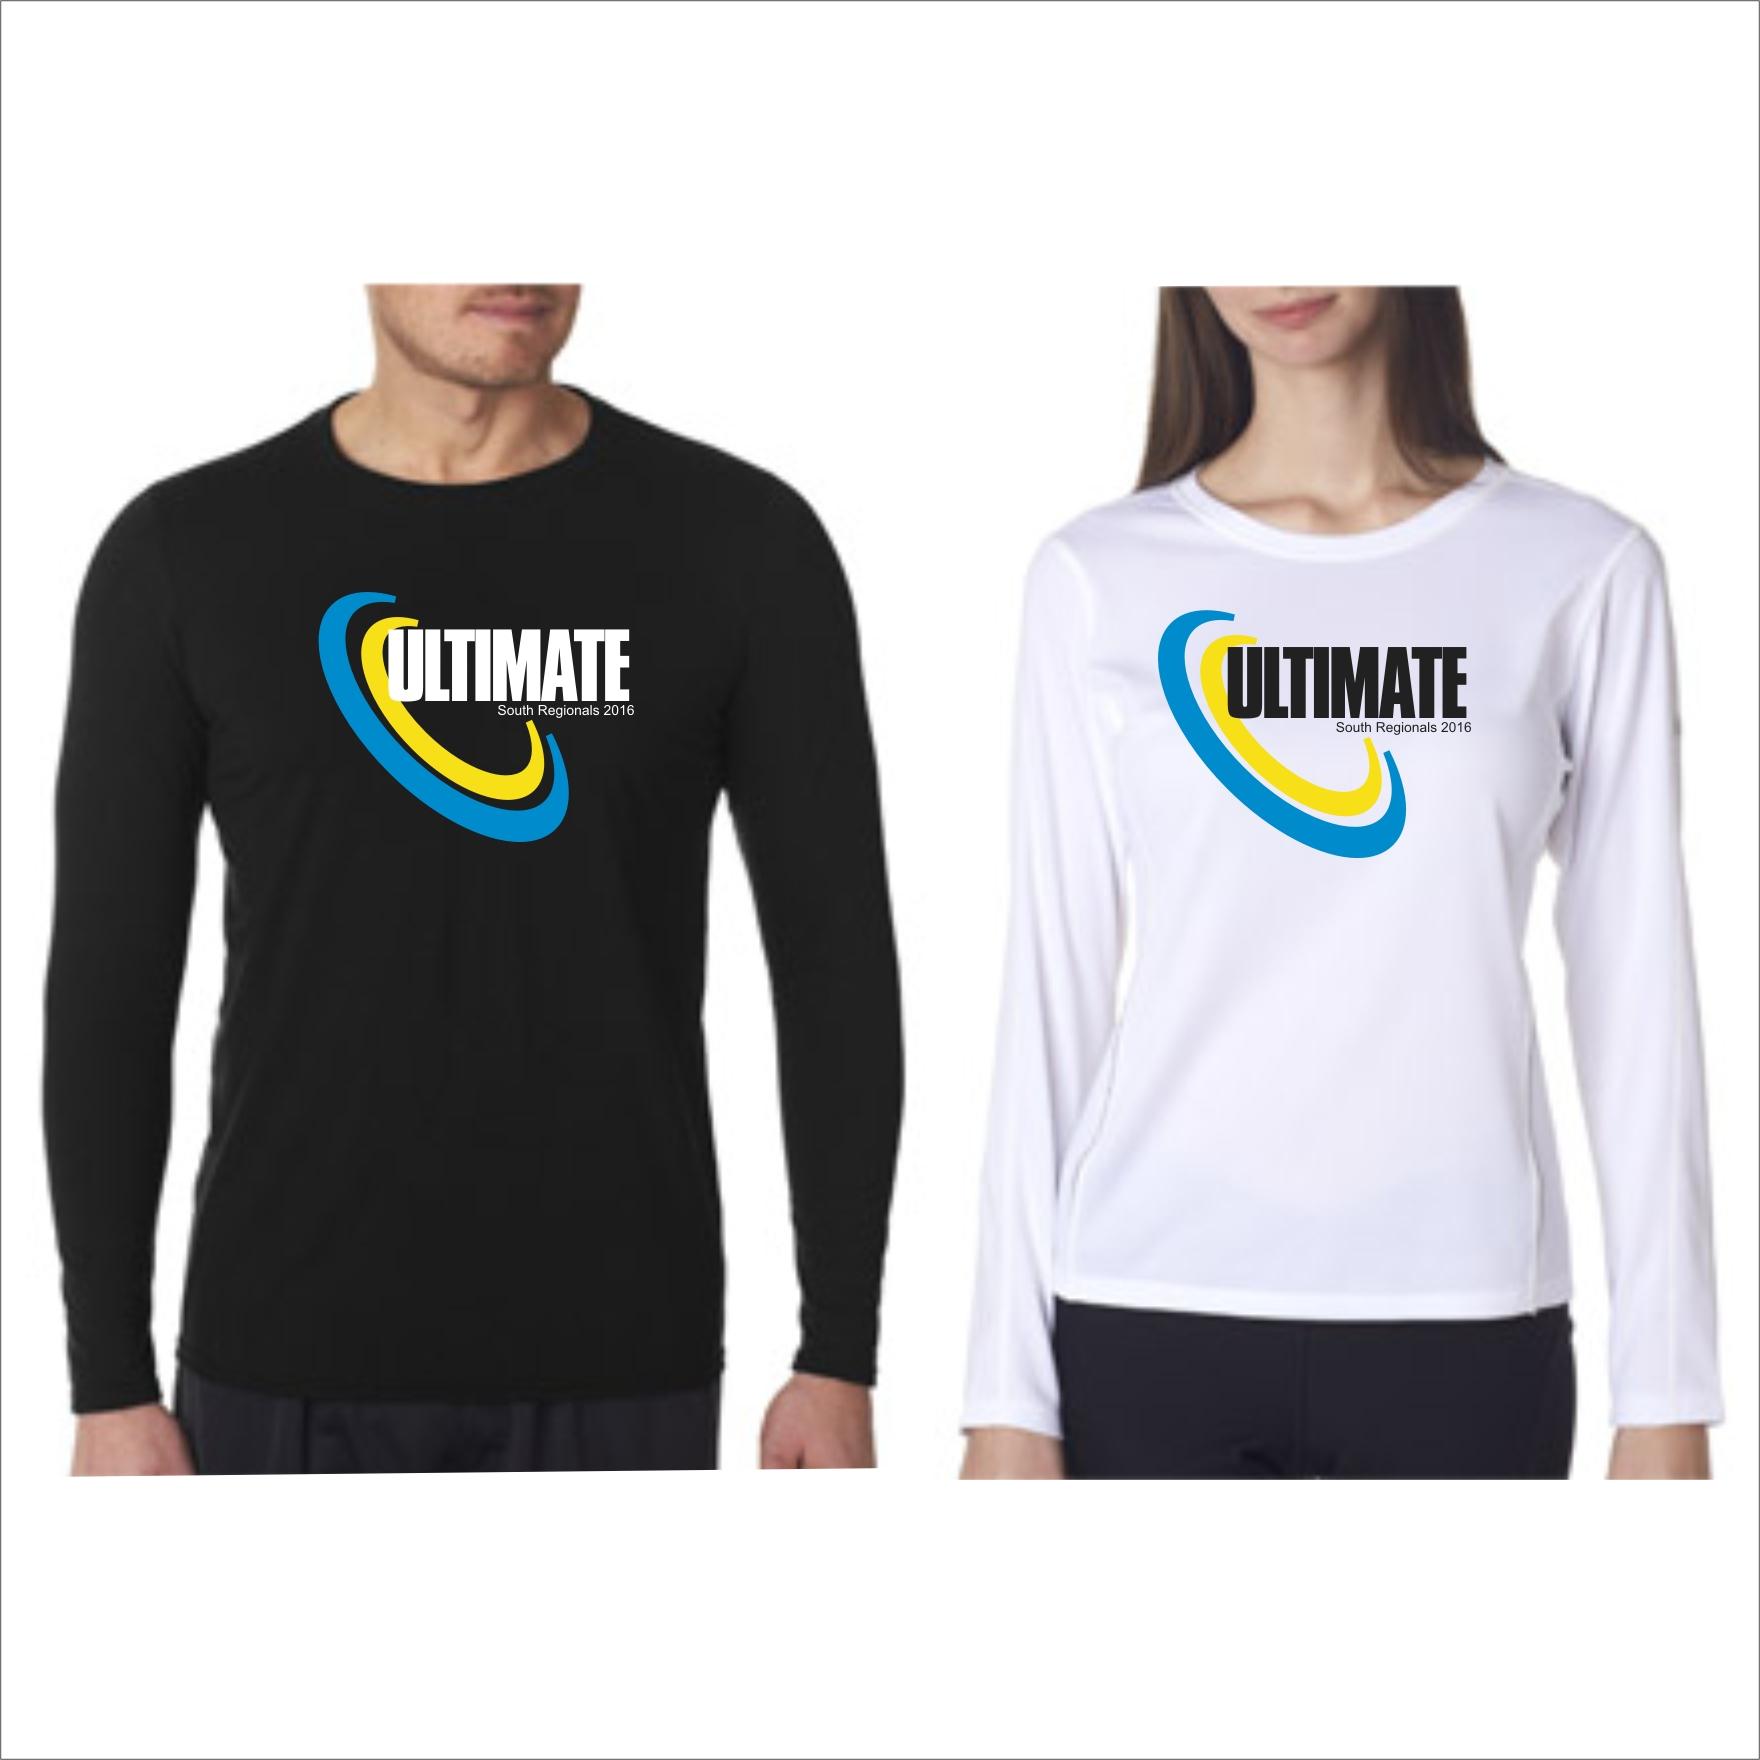 2016 Ultimate LS tshirt single.jpg